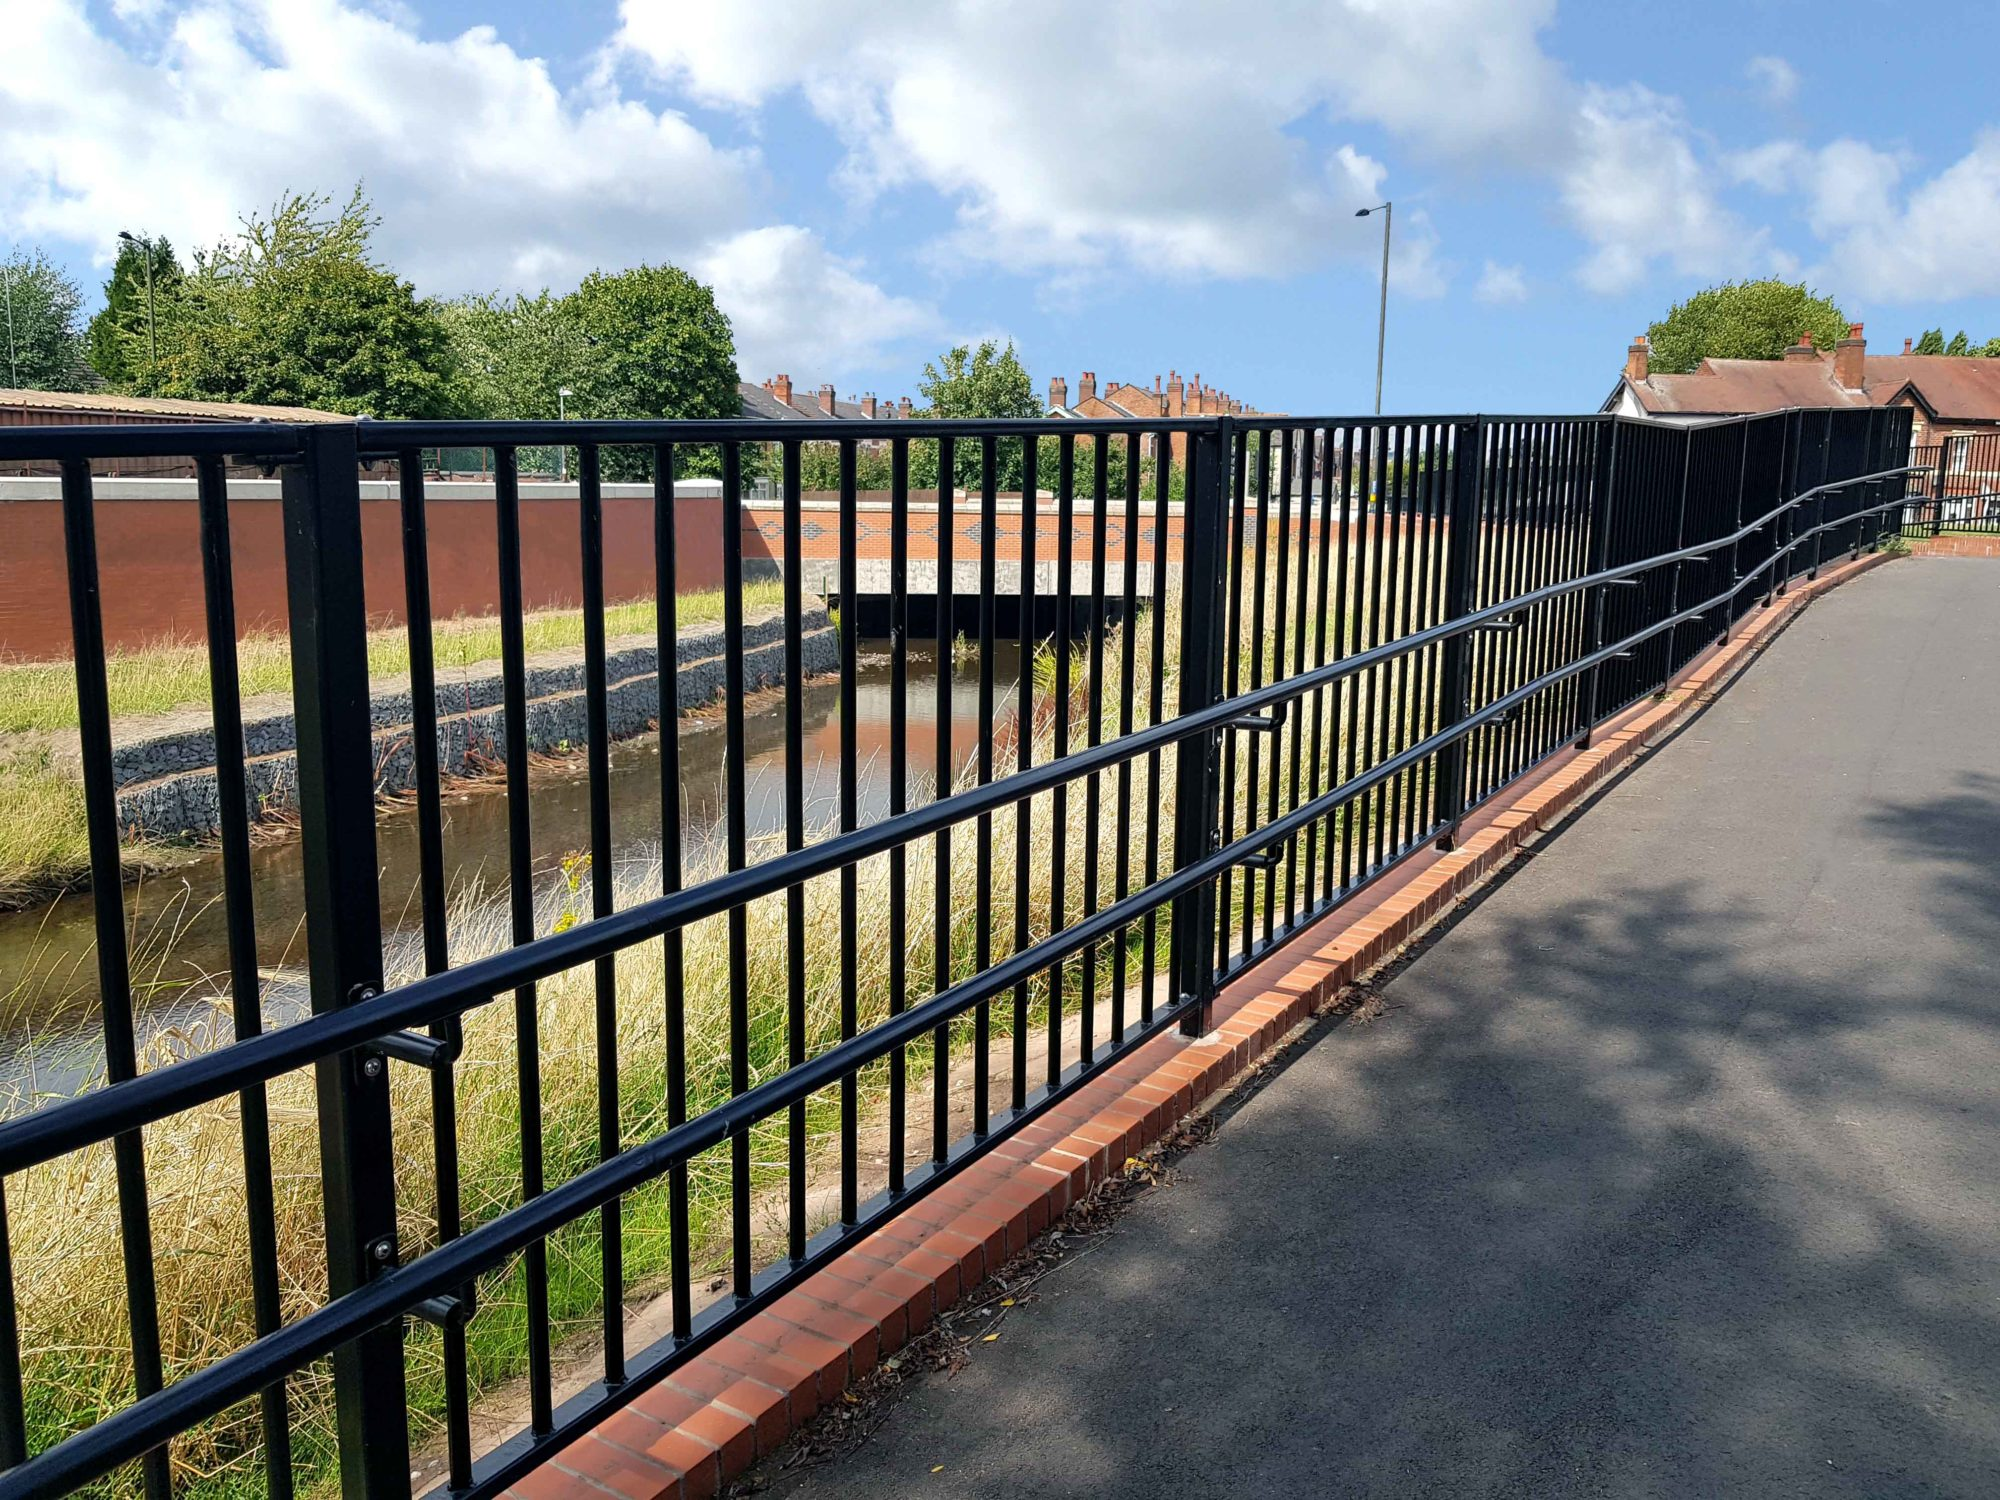 Alpha Rail Pedestrian Parapet Guardrail at Selly Park